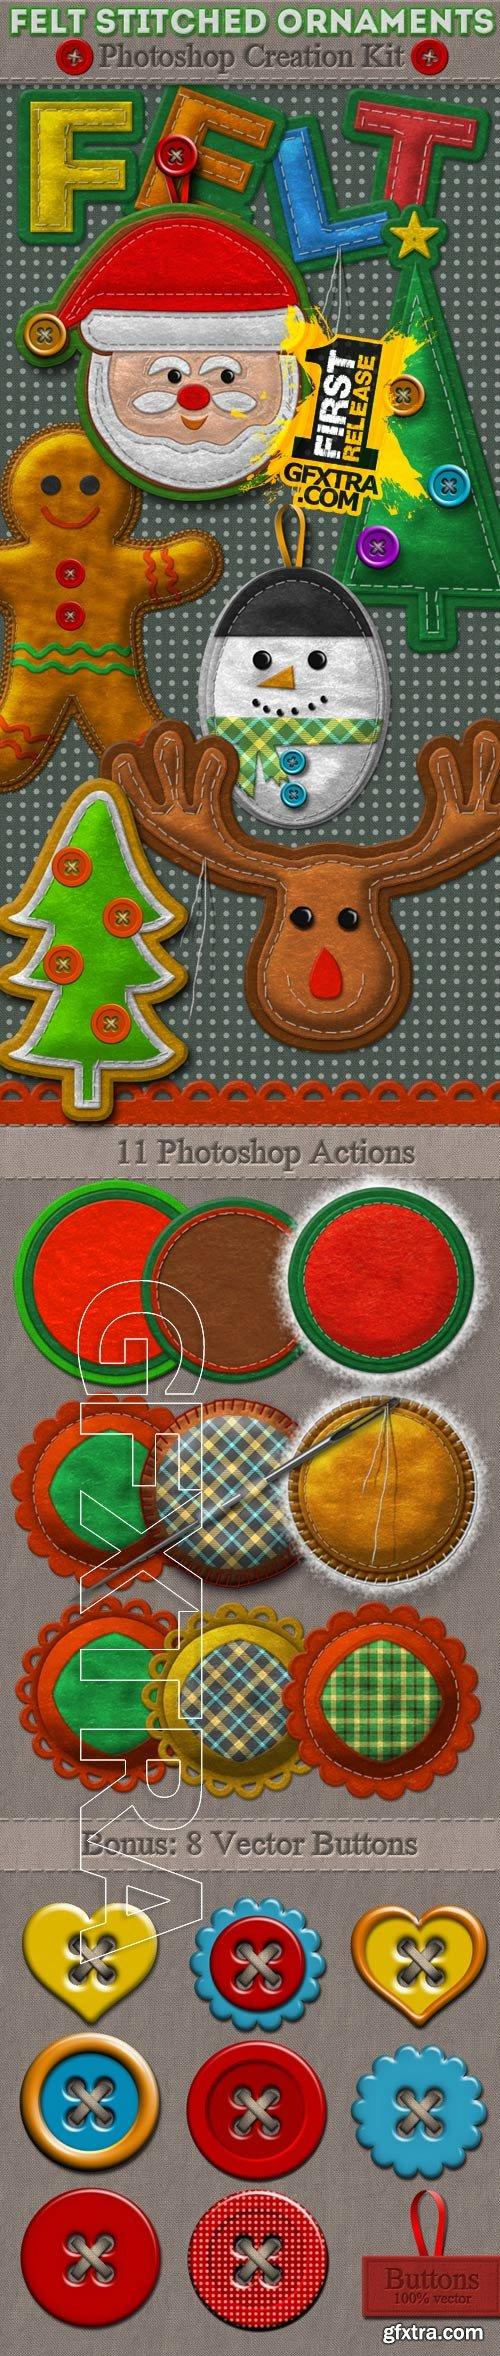 GraphicRiver - Felt Stitched Ornaments Photoshop Creation Kit 9693079